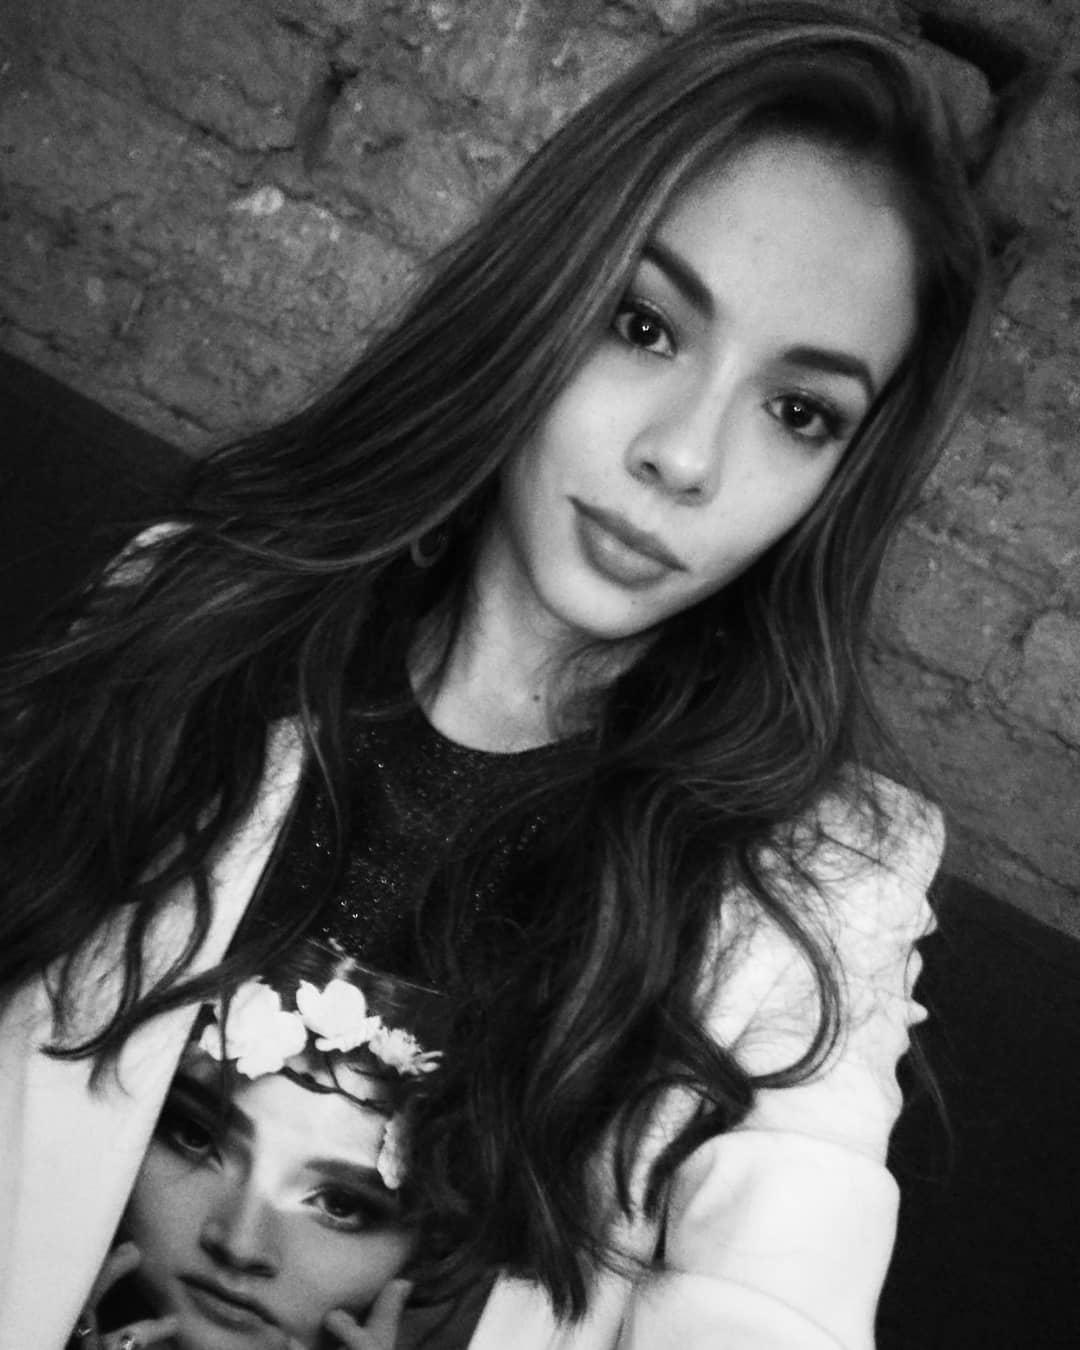 gina aguirre, virreyna de miss latinoamerica 2019. 47192910